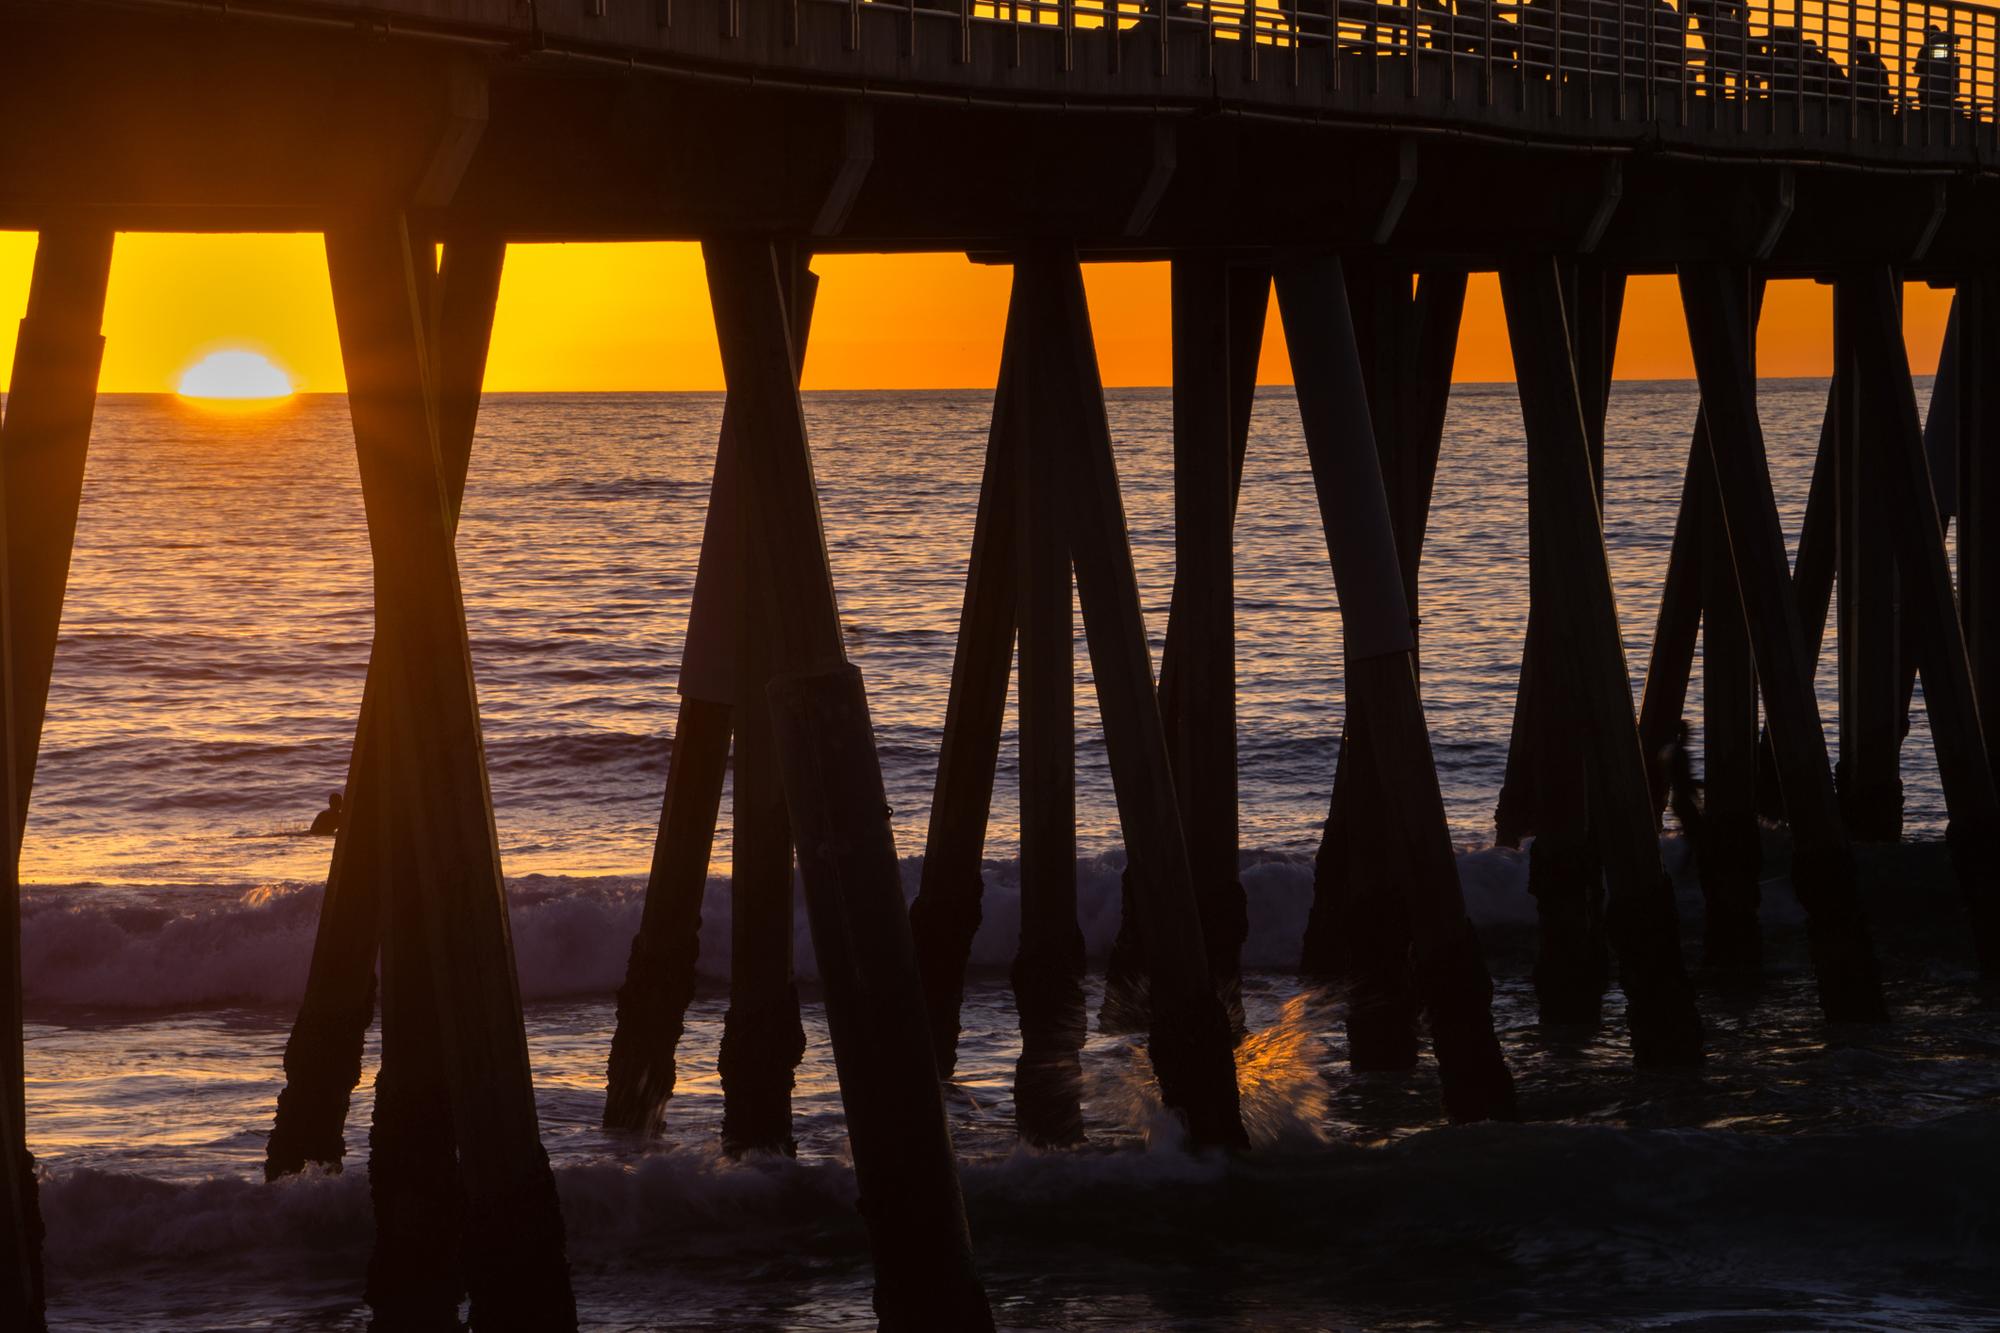 El Segundo Beach, California